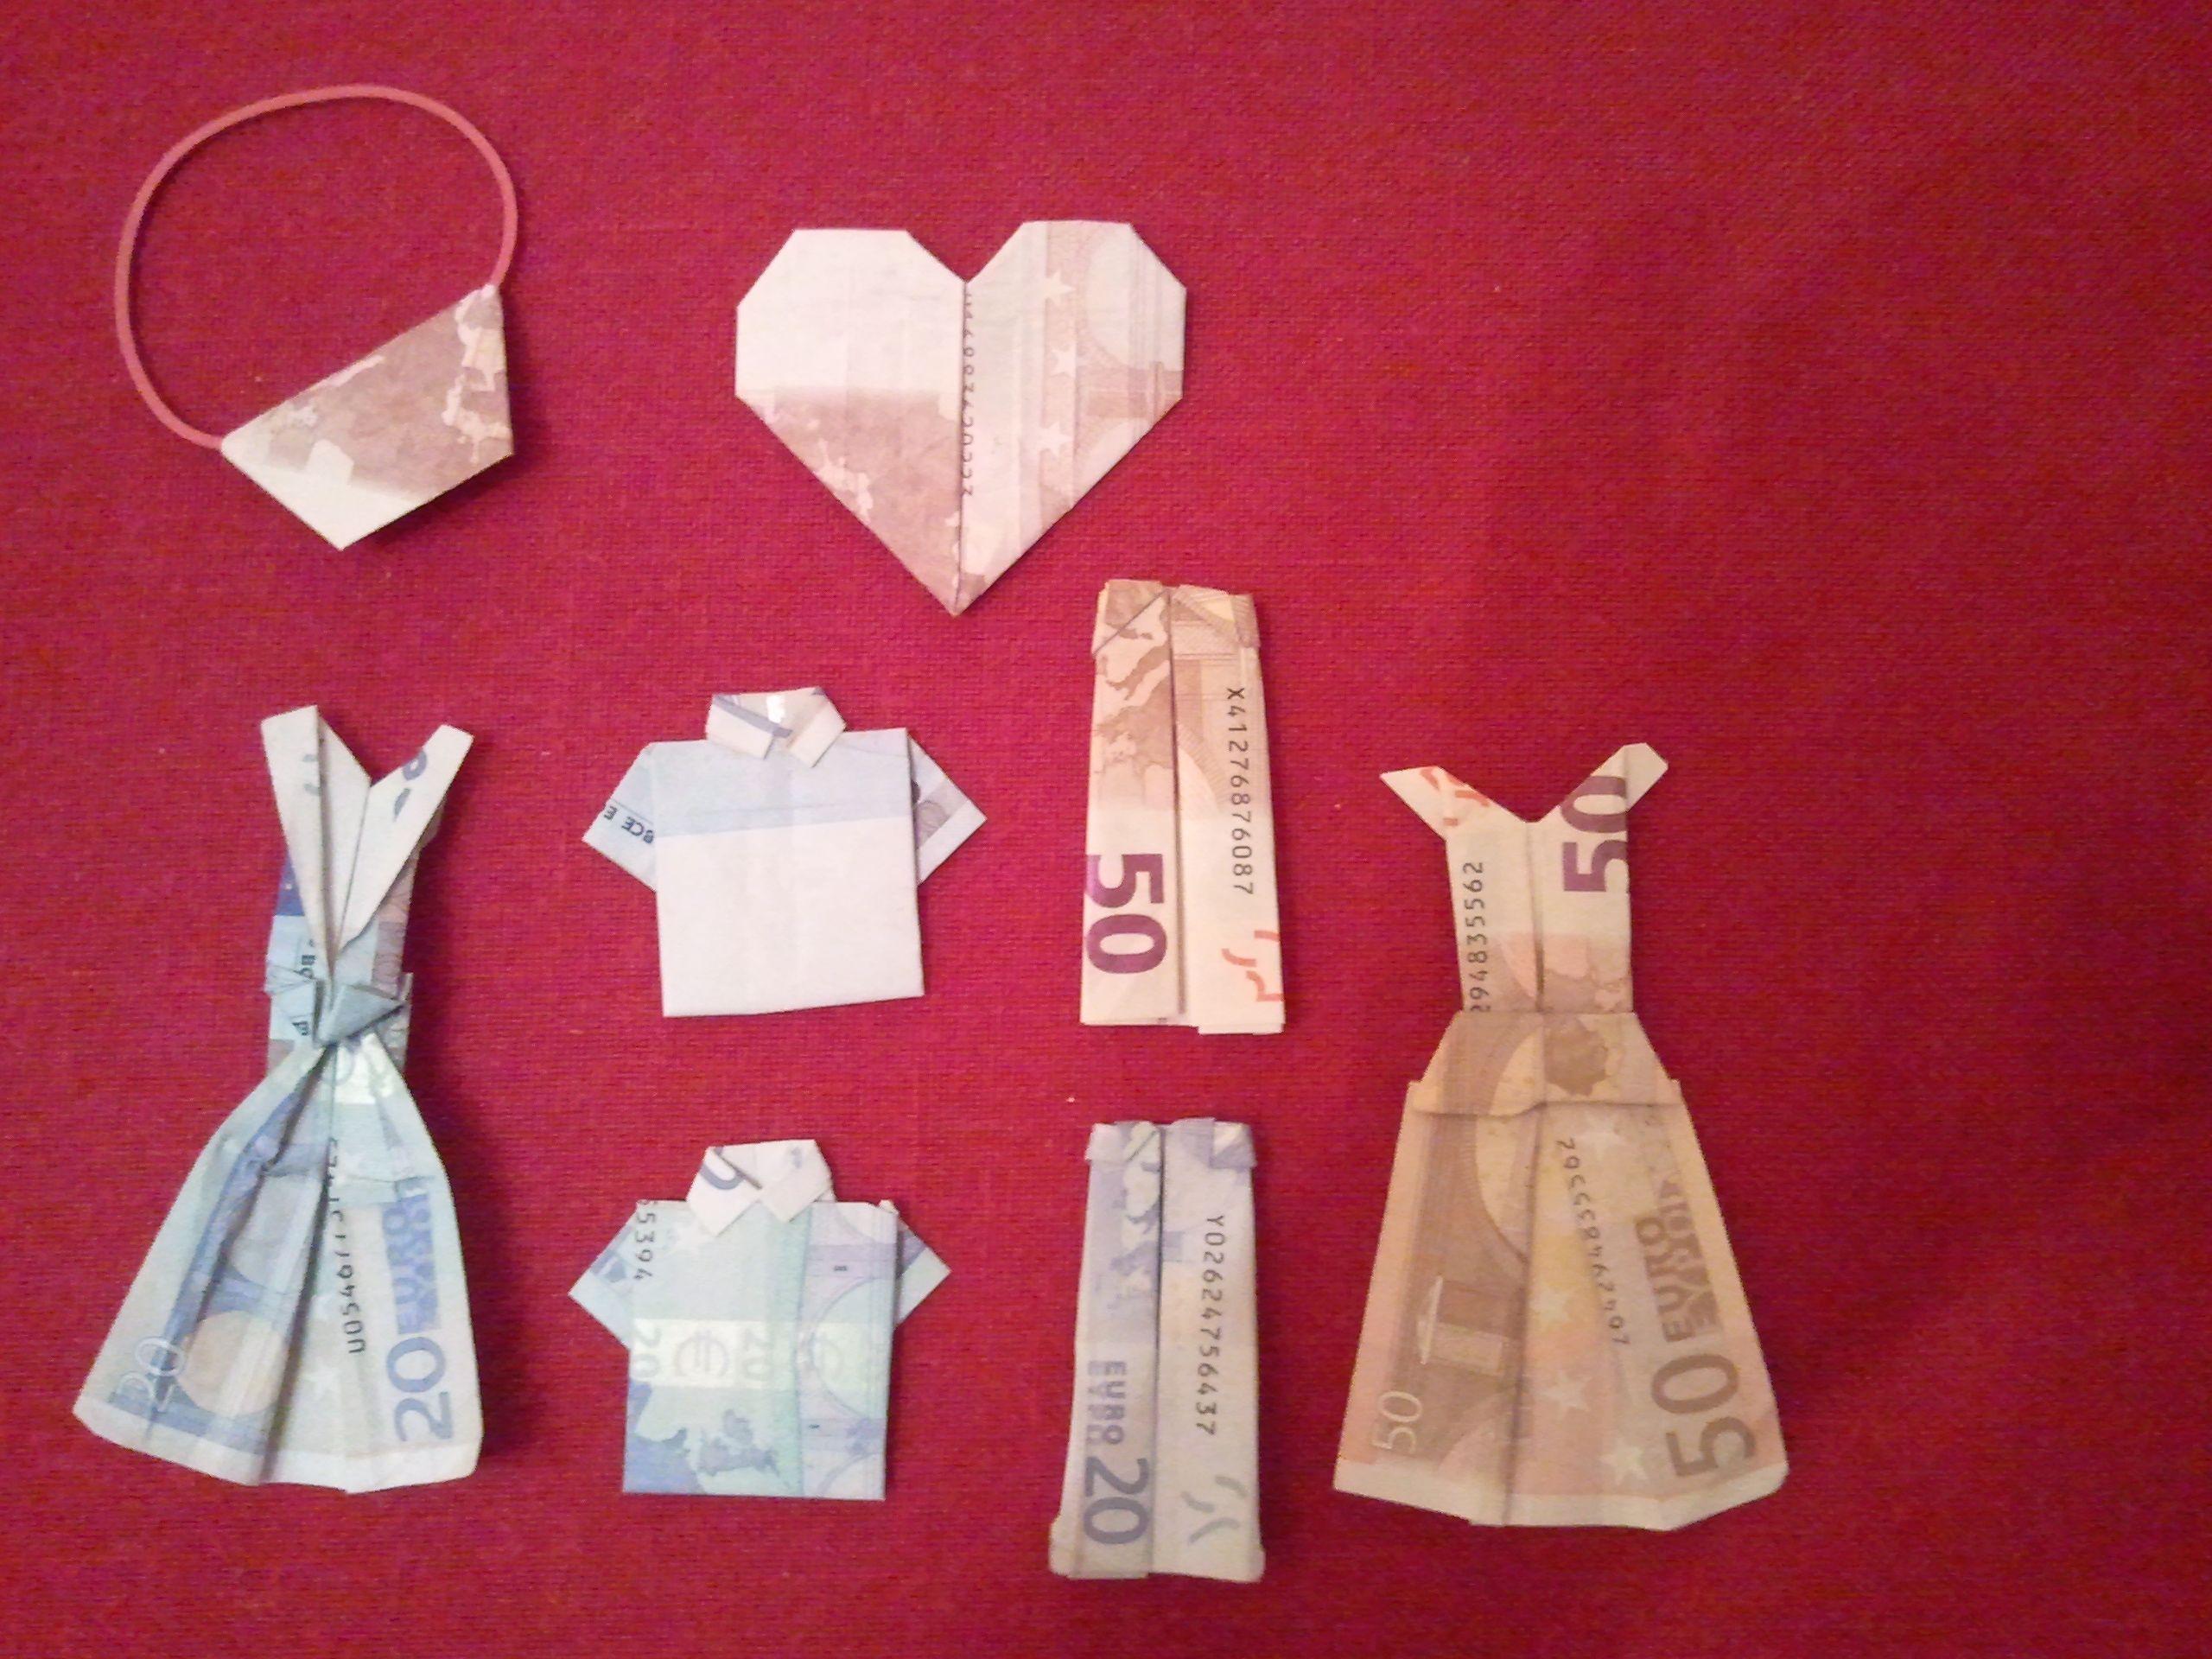 Origami - Money Folding - present | kado varpakking - Geld ... - photo#11